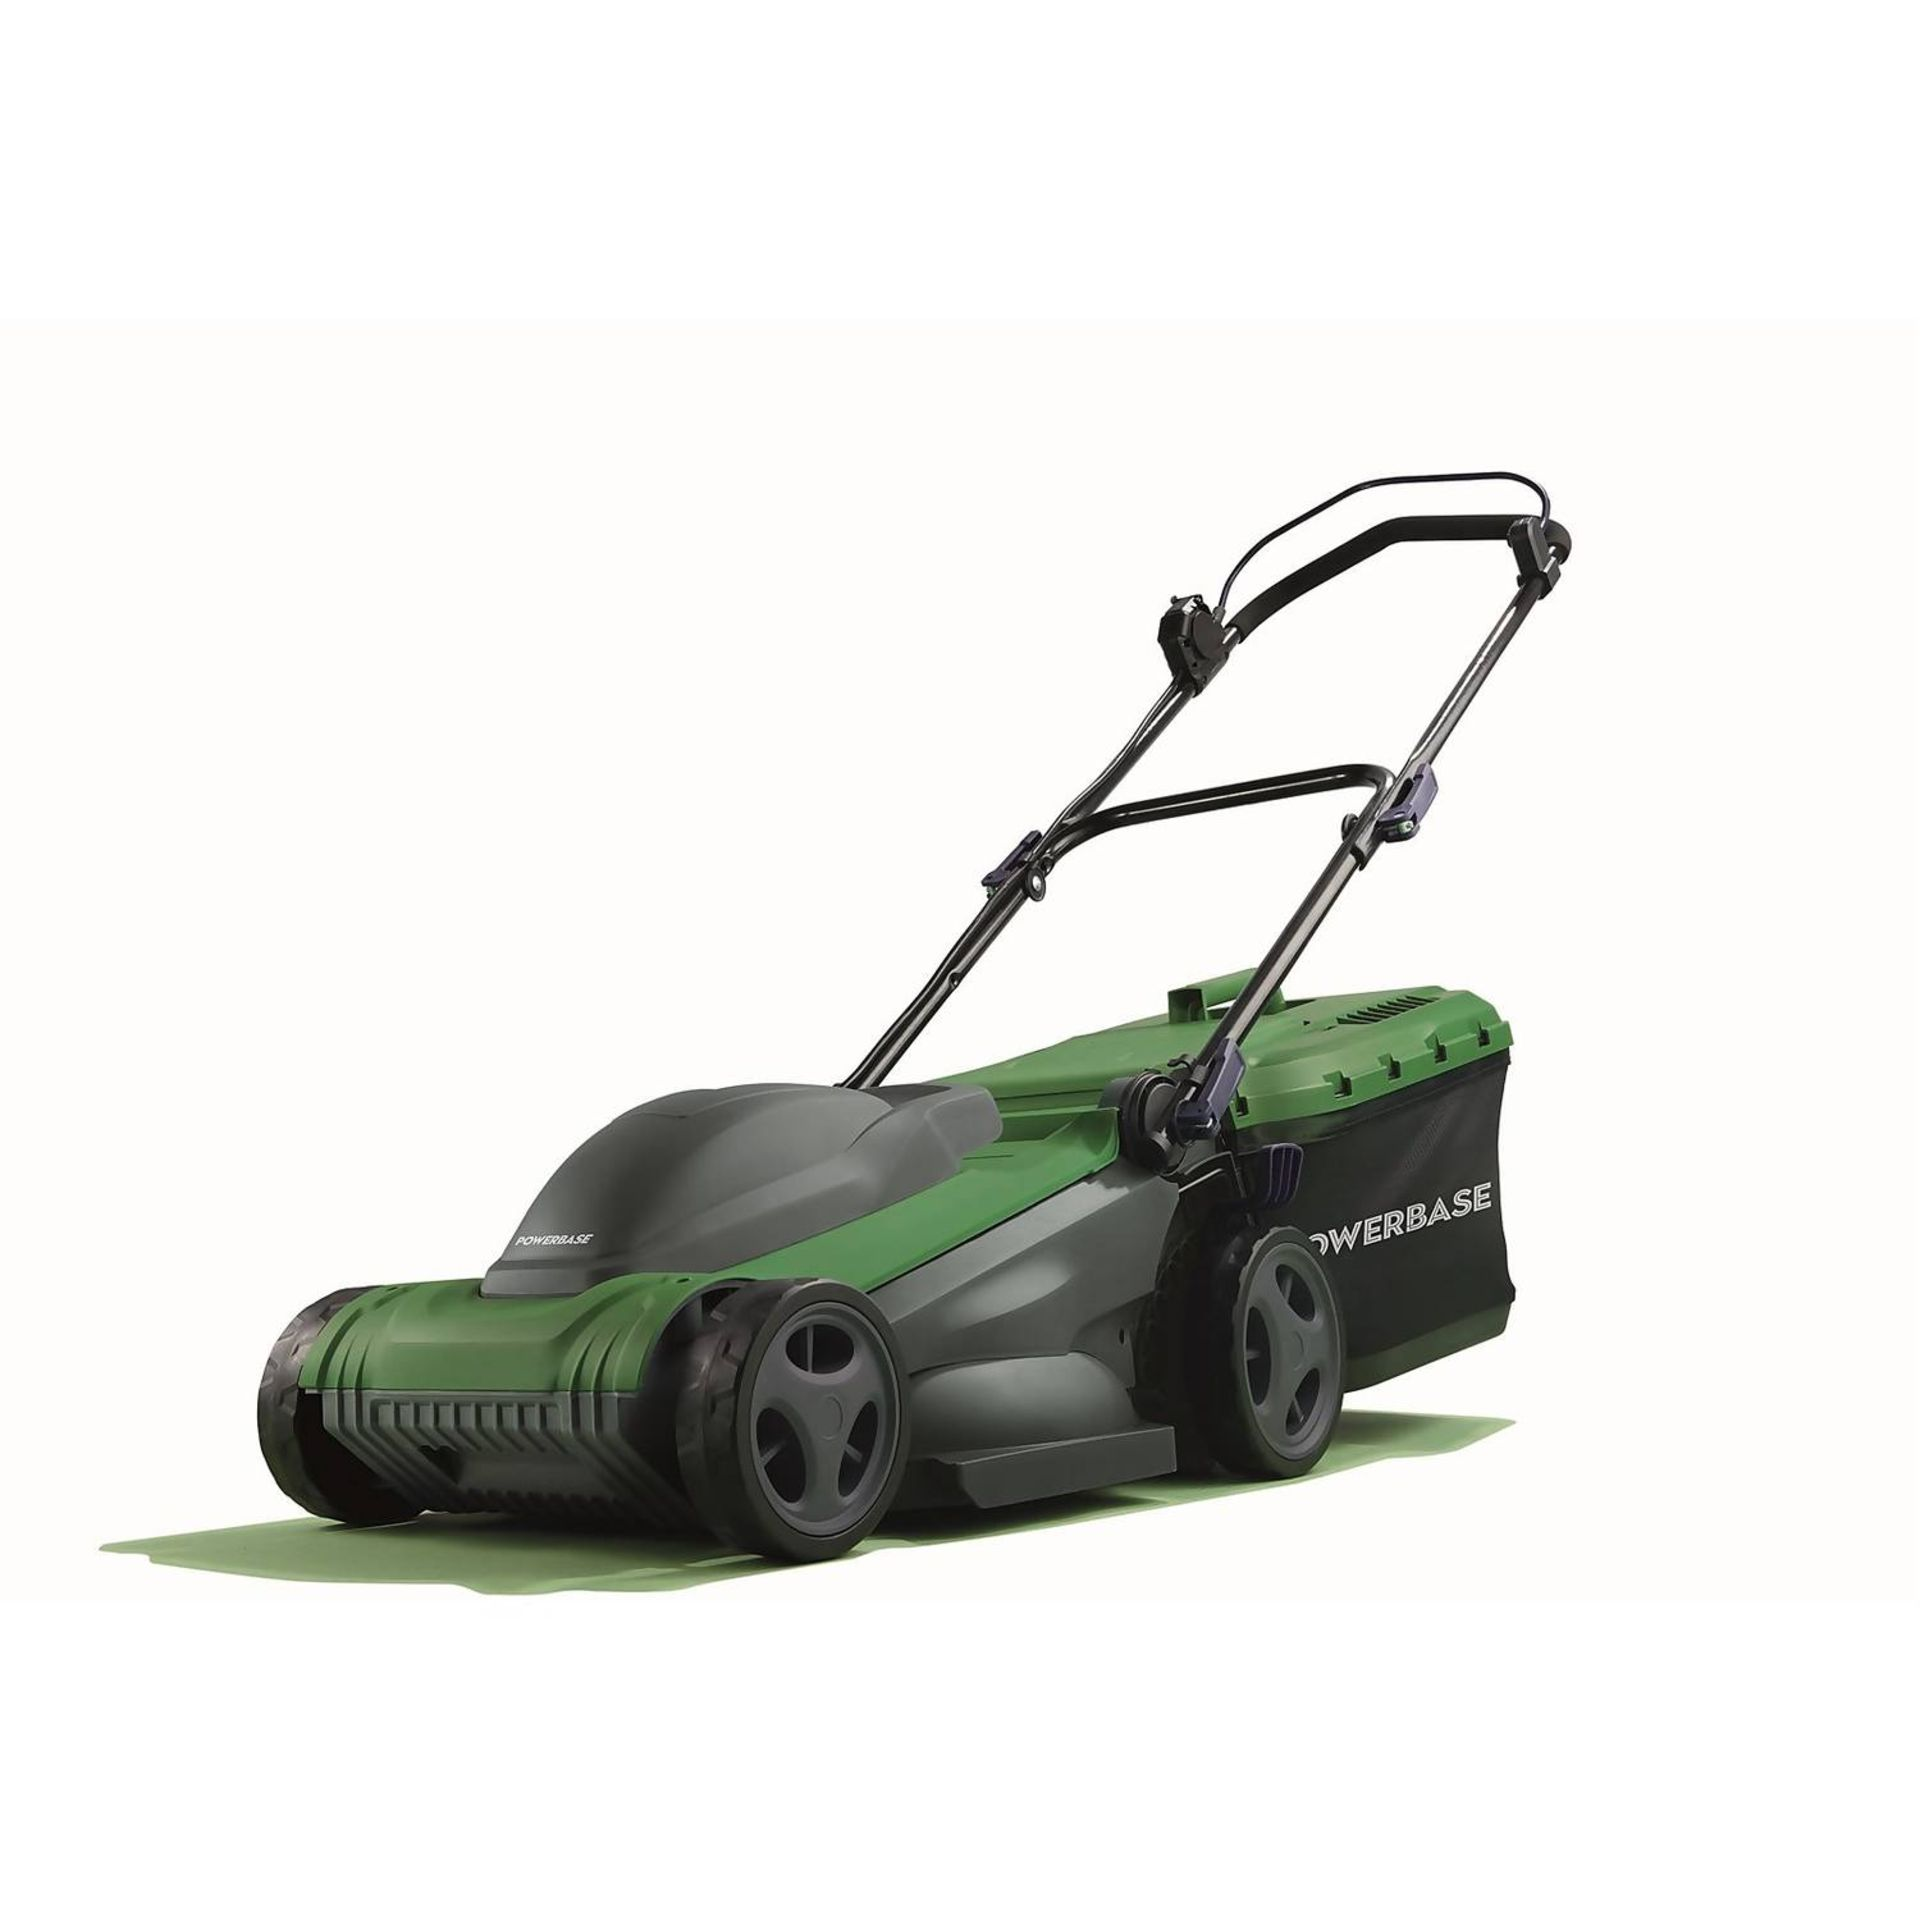 (P2) 2x Powerbase 37cm 1600W Electric Rotary Lawn Mower. RRP £99.00.